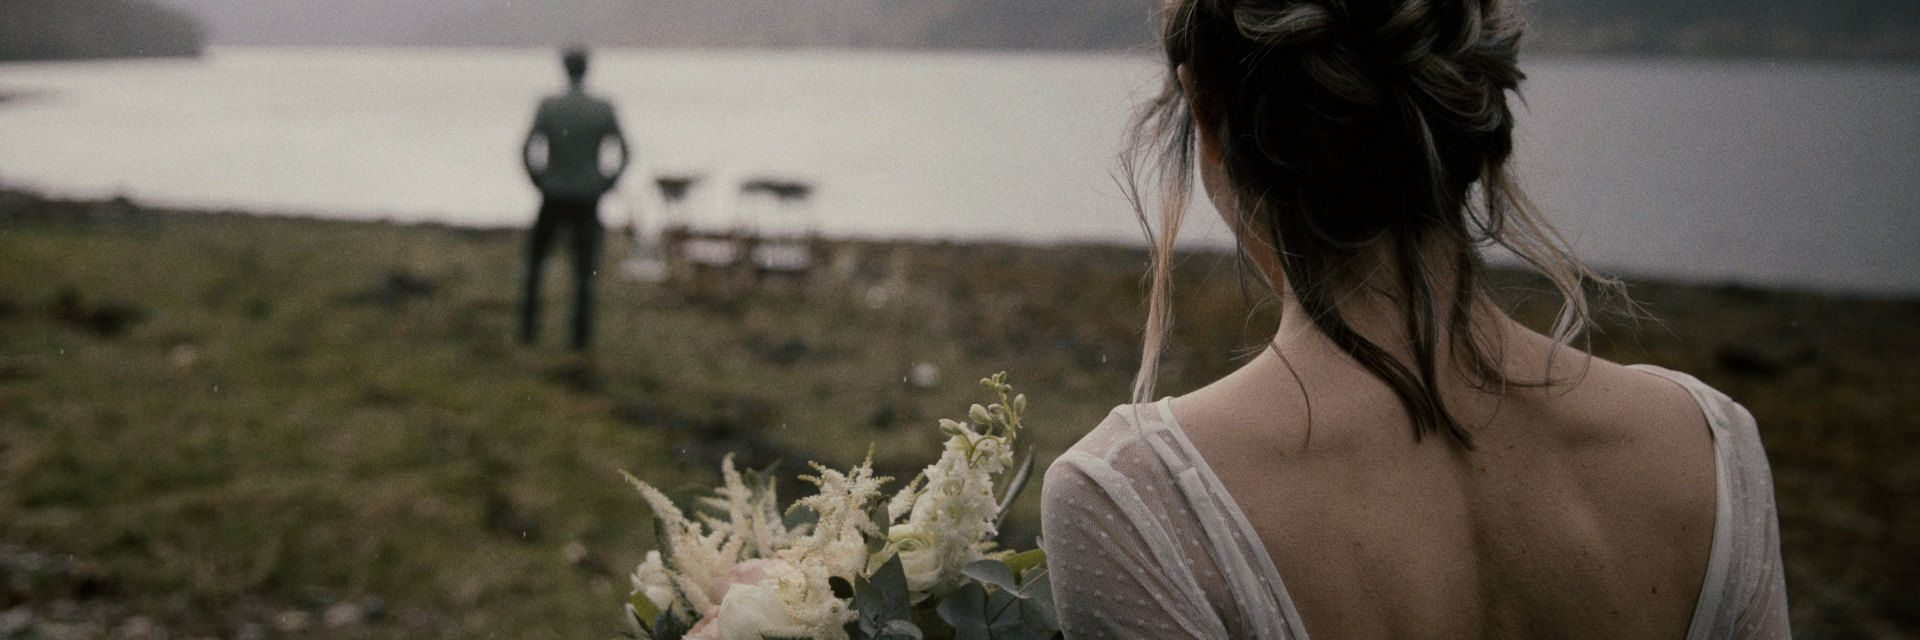 Stavanger-wedding-videographer-cinemate-films-02